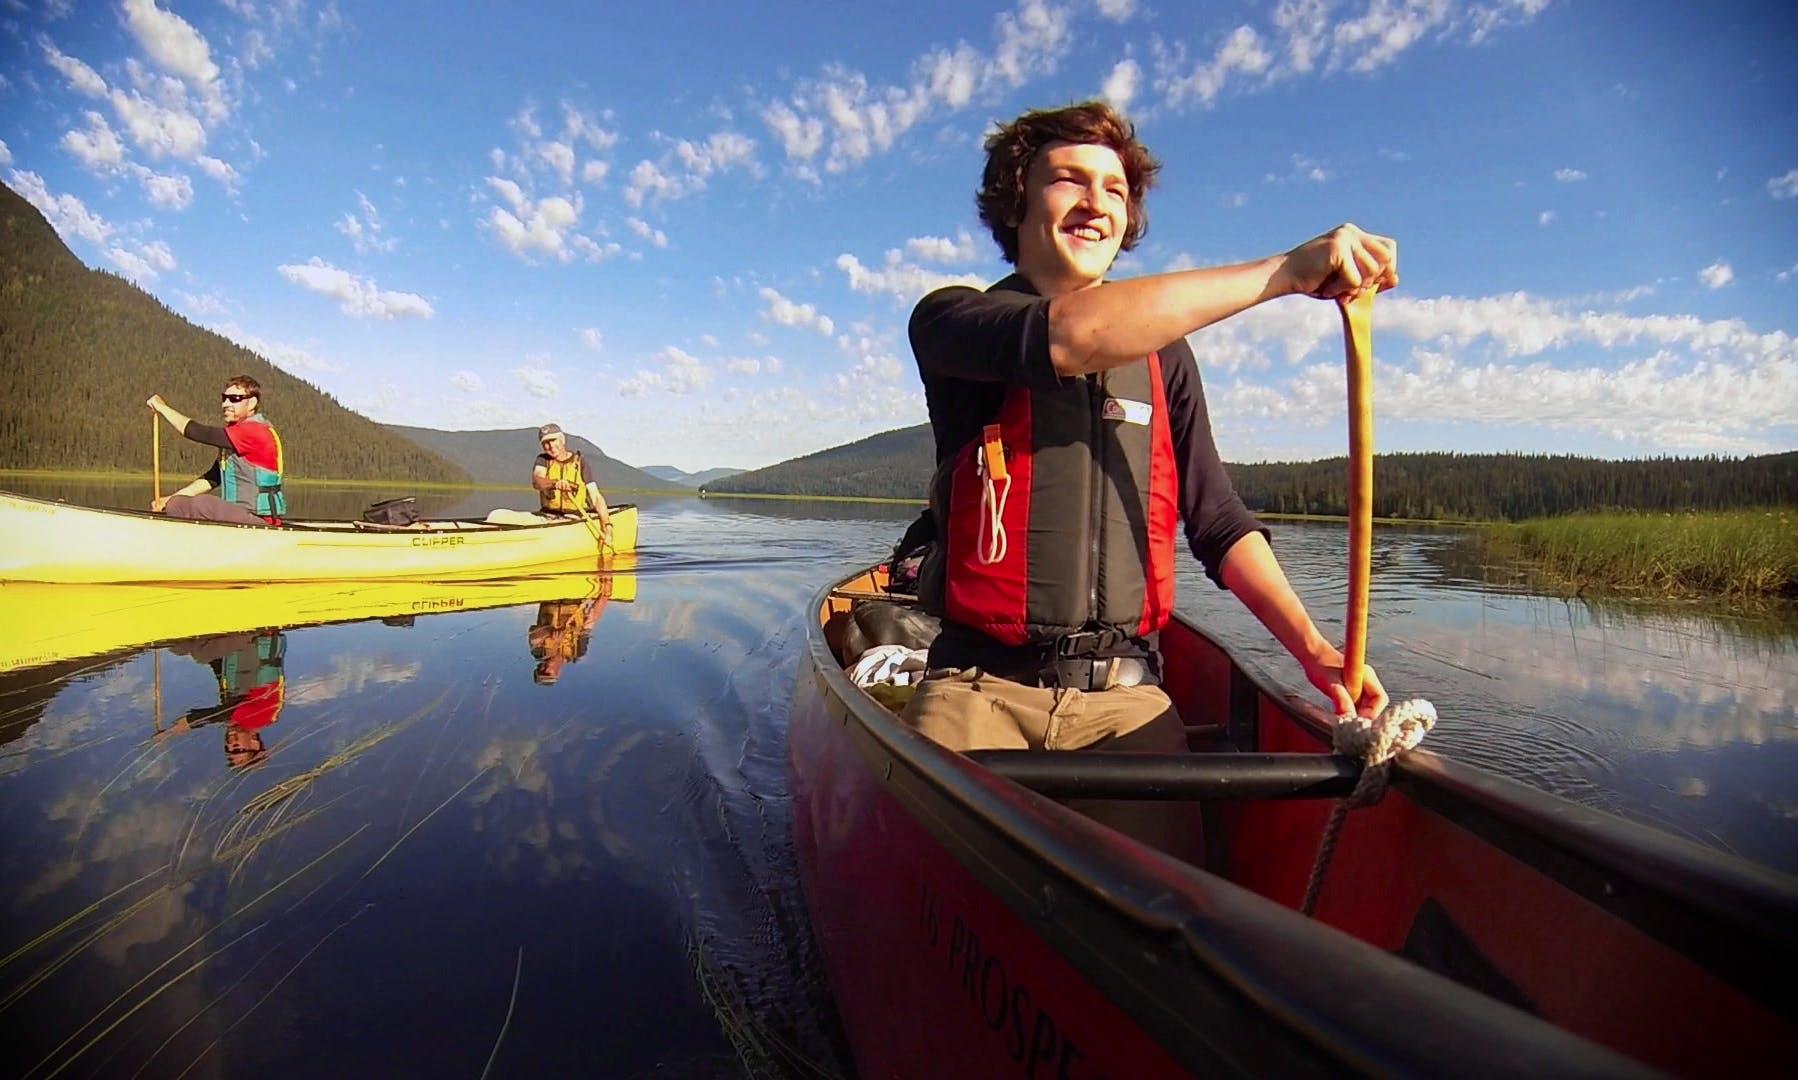 Canoe Rental in Labelle, Canada